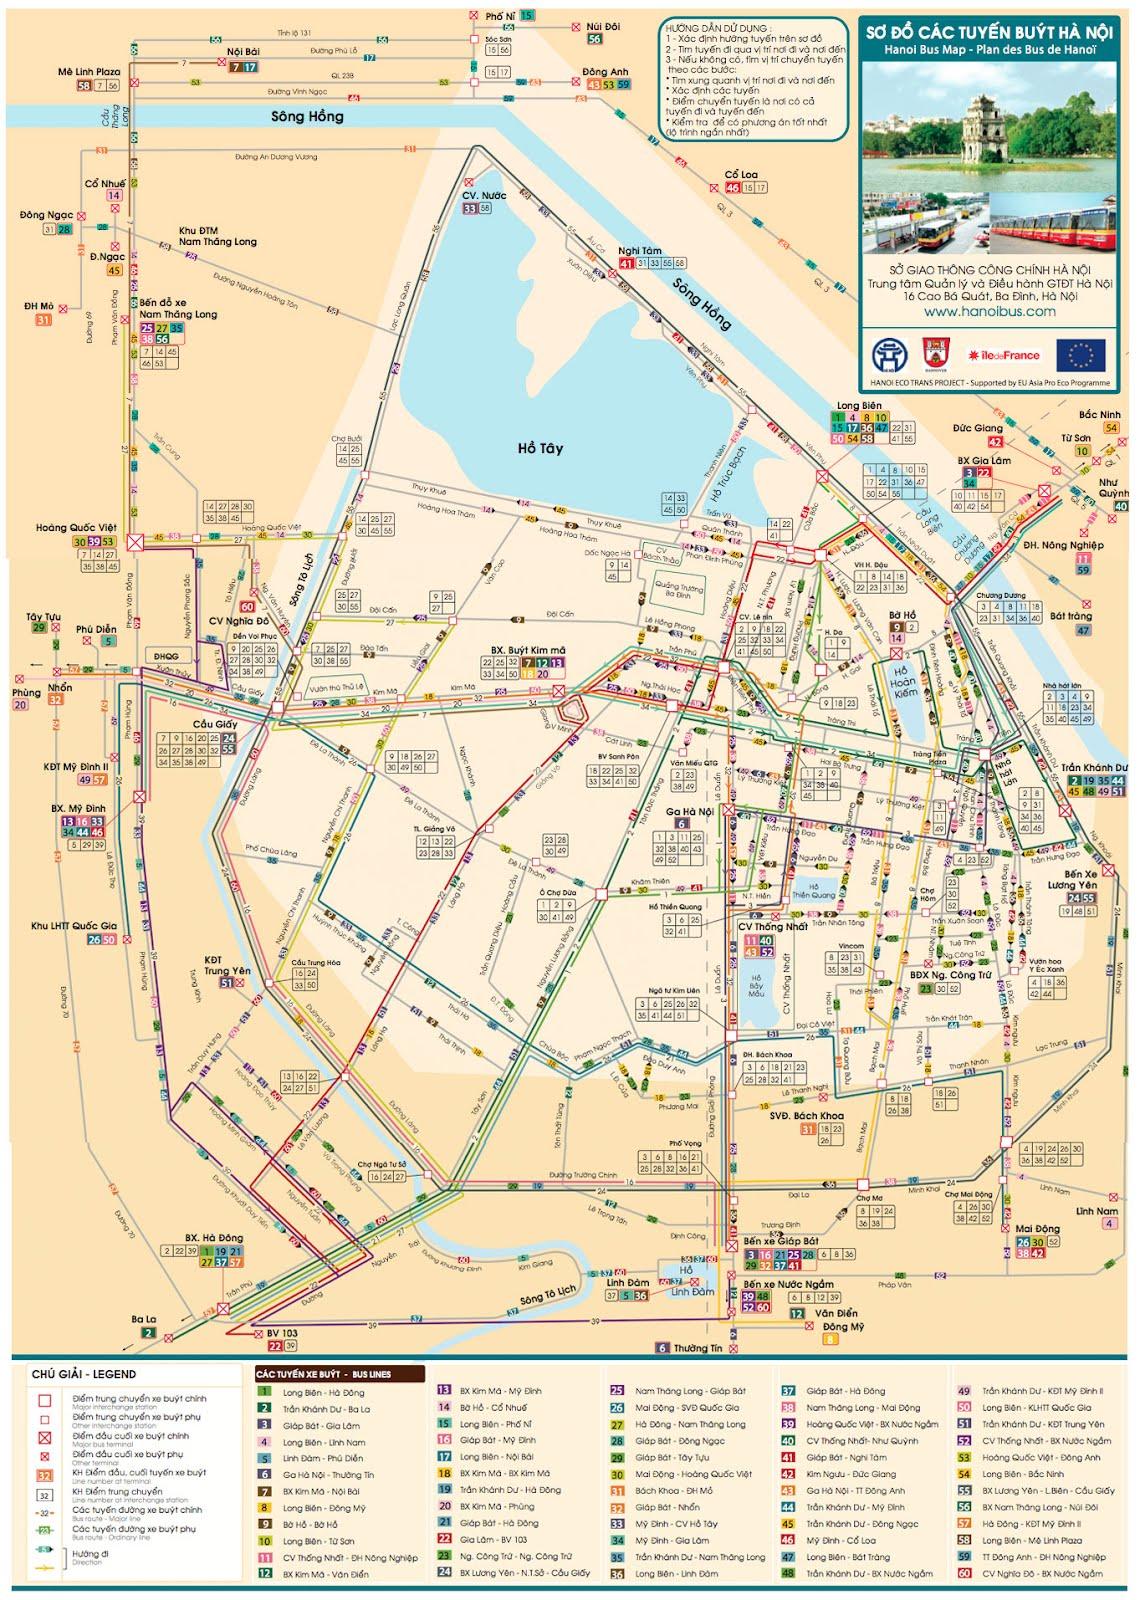 Map of Hanoi Vietnam\'s capital - Vietnam